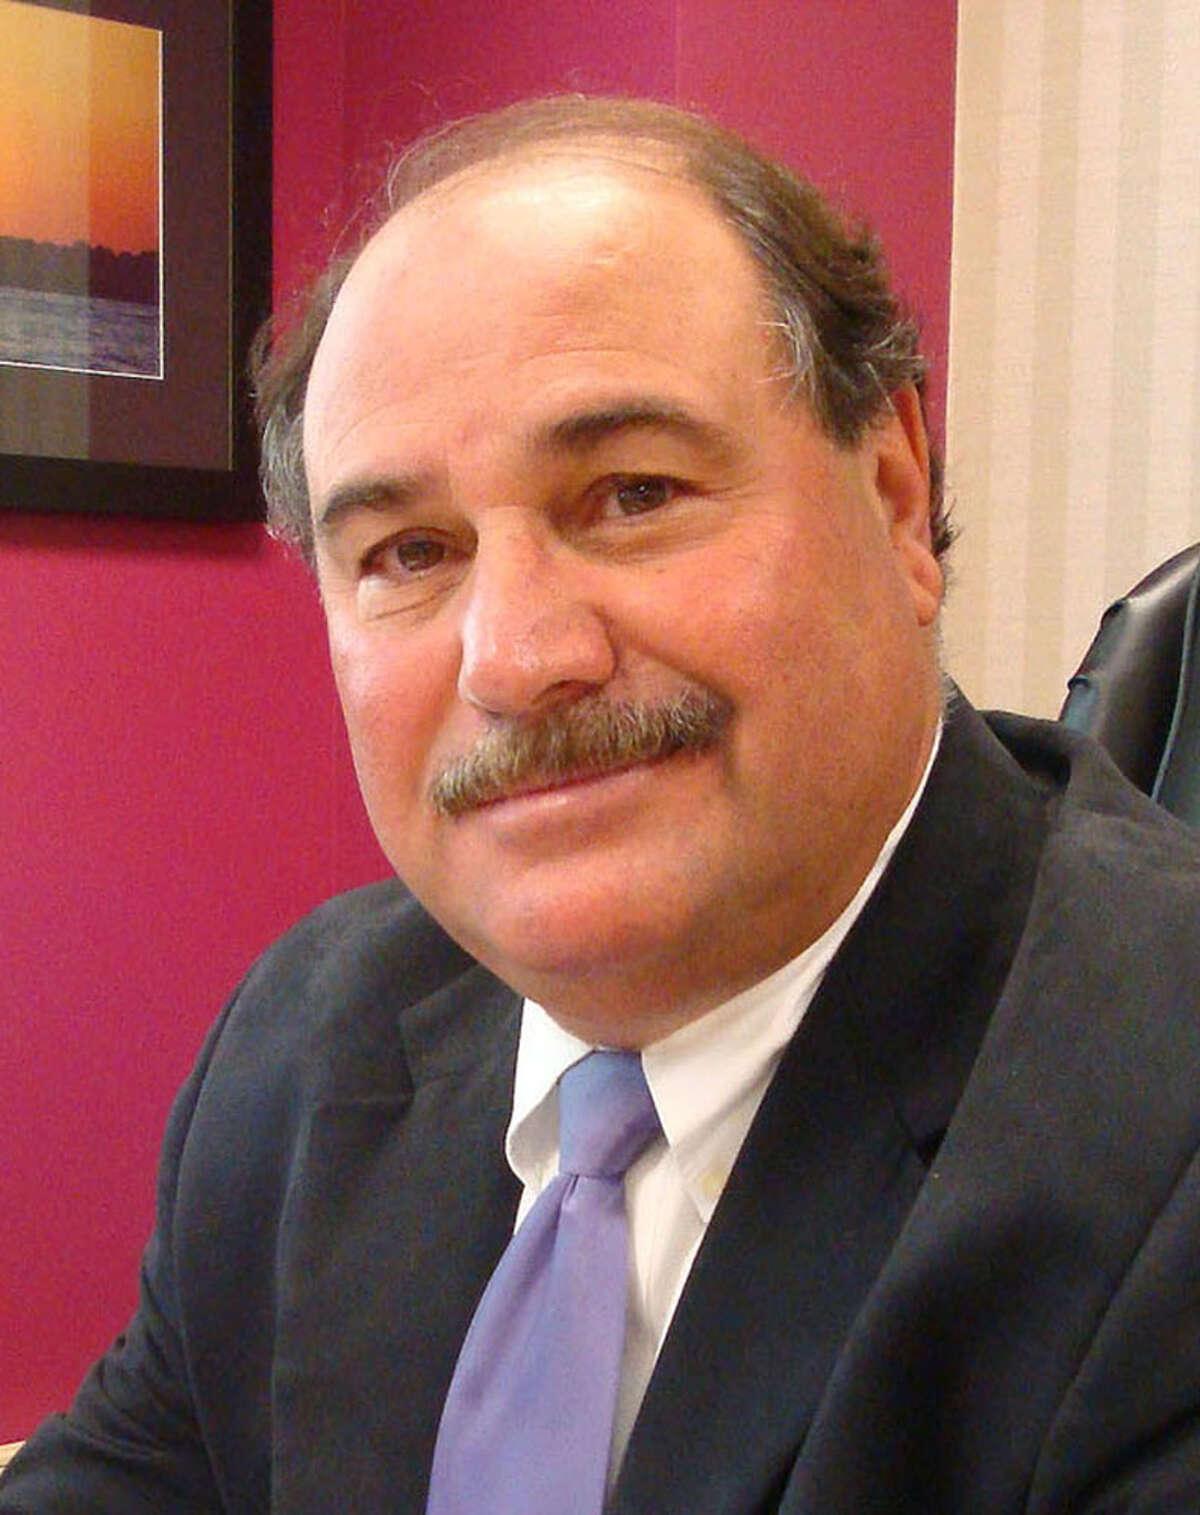 Dr. Sal Pascarella, Danbury schools superintendent